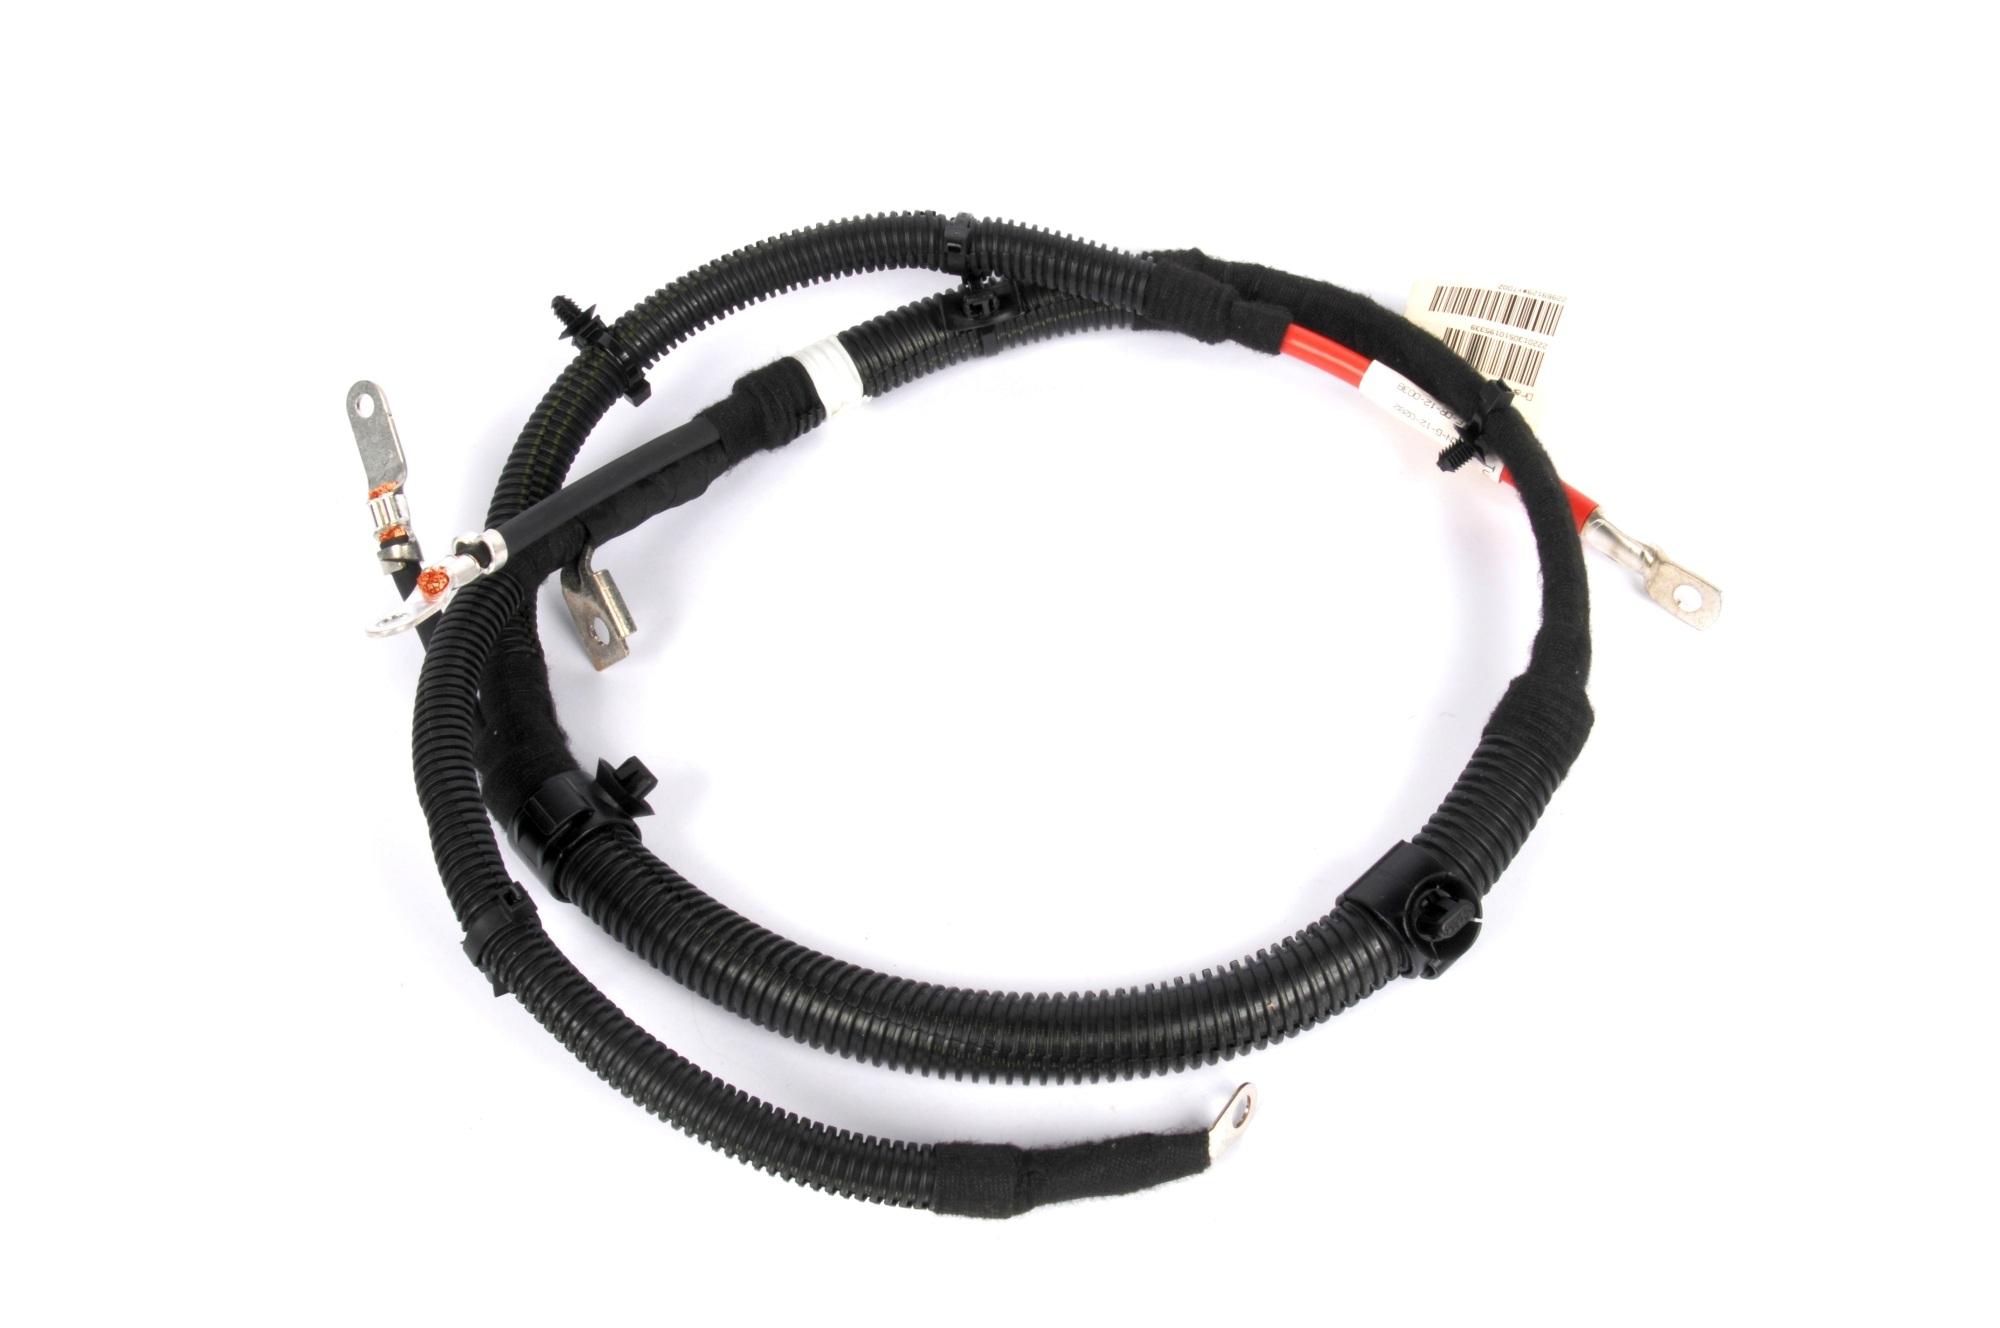 ACDELCO GM ORIGINAL EQUIPMENT - Alternator and Starter Cable - DCB 22969129